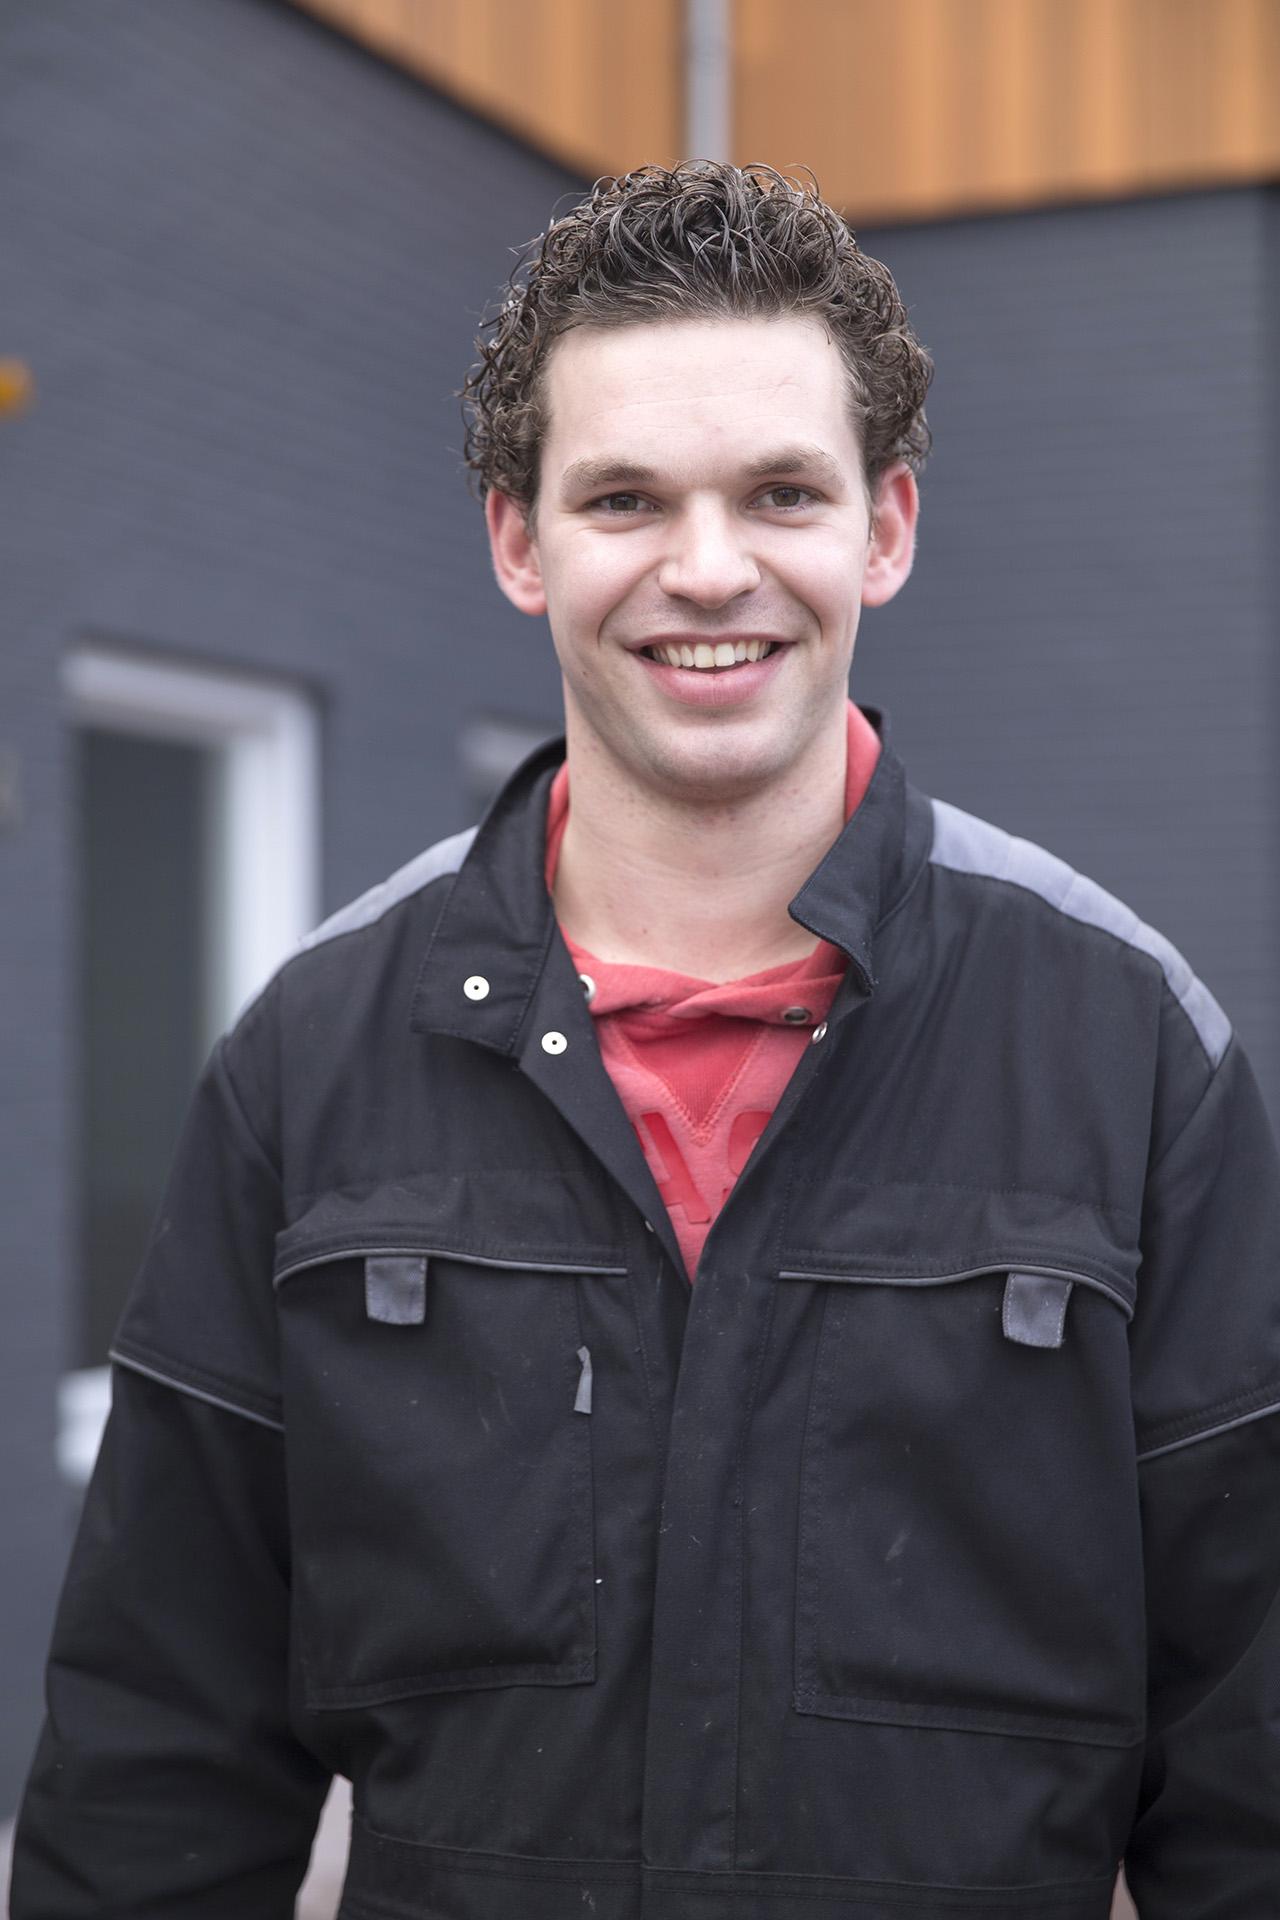 Martin Hooikammer